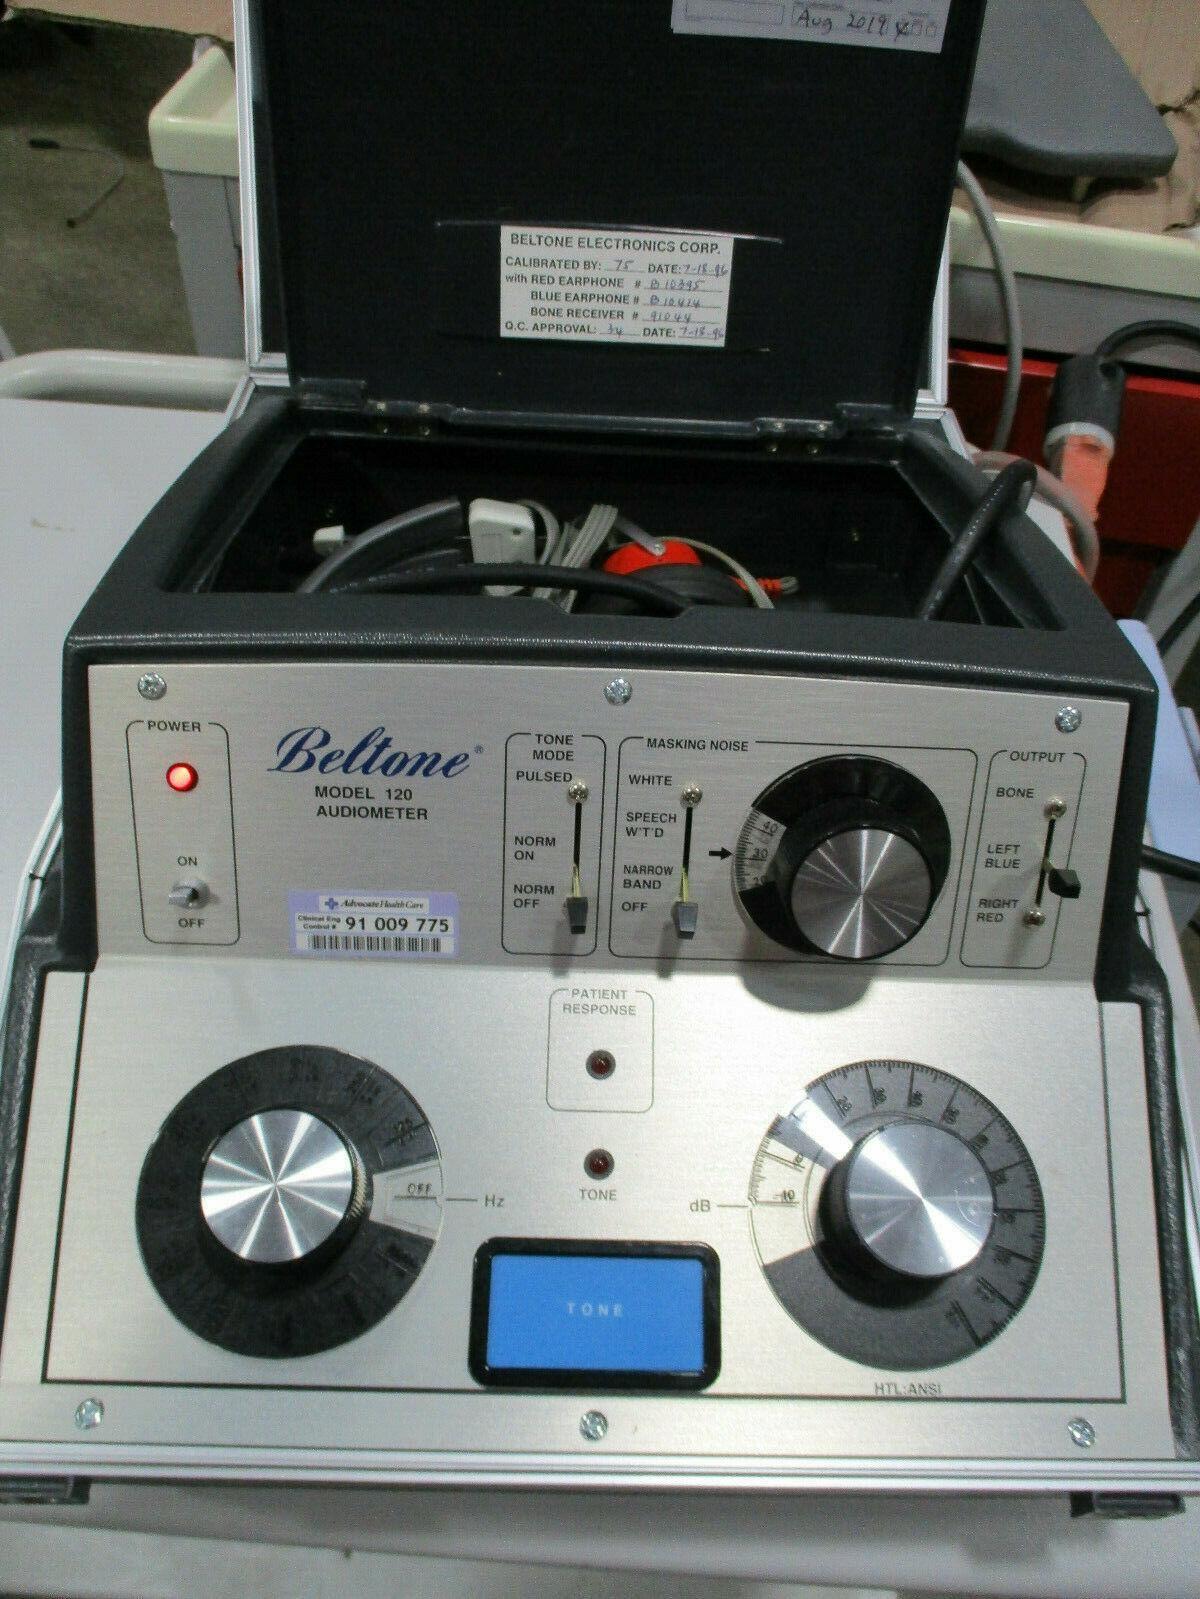 Beltone Electronics 120 Audiometer W/ Headphones Set